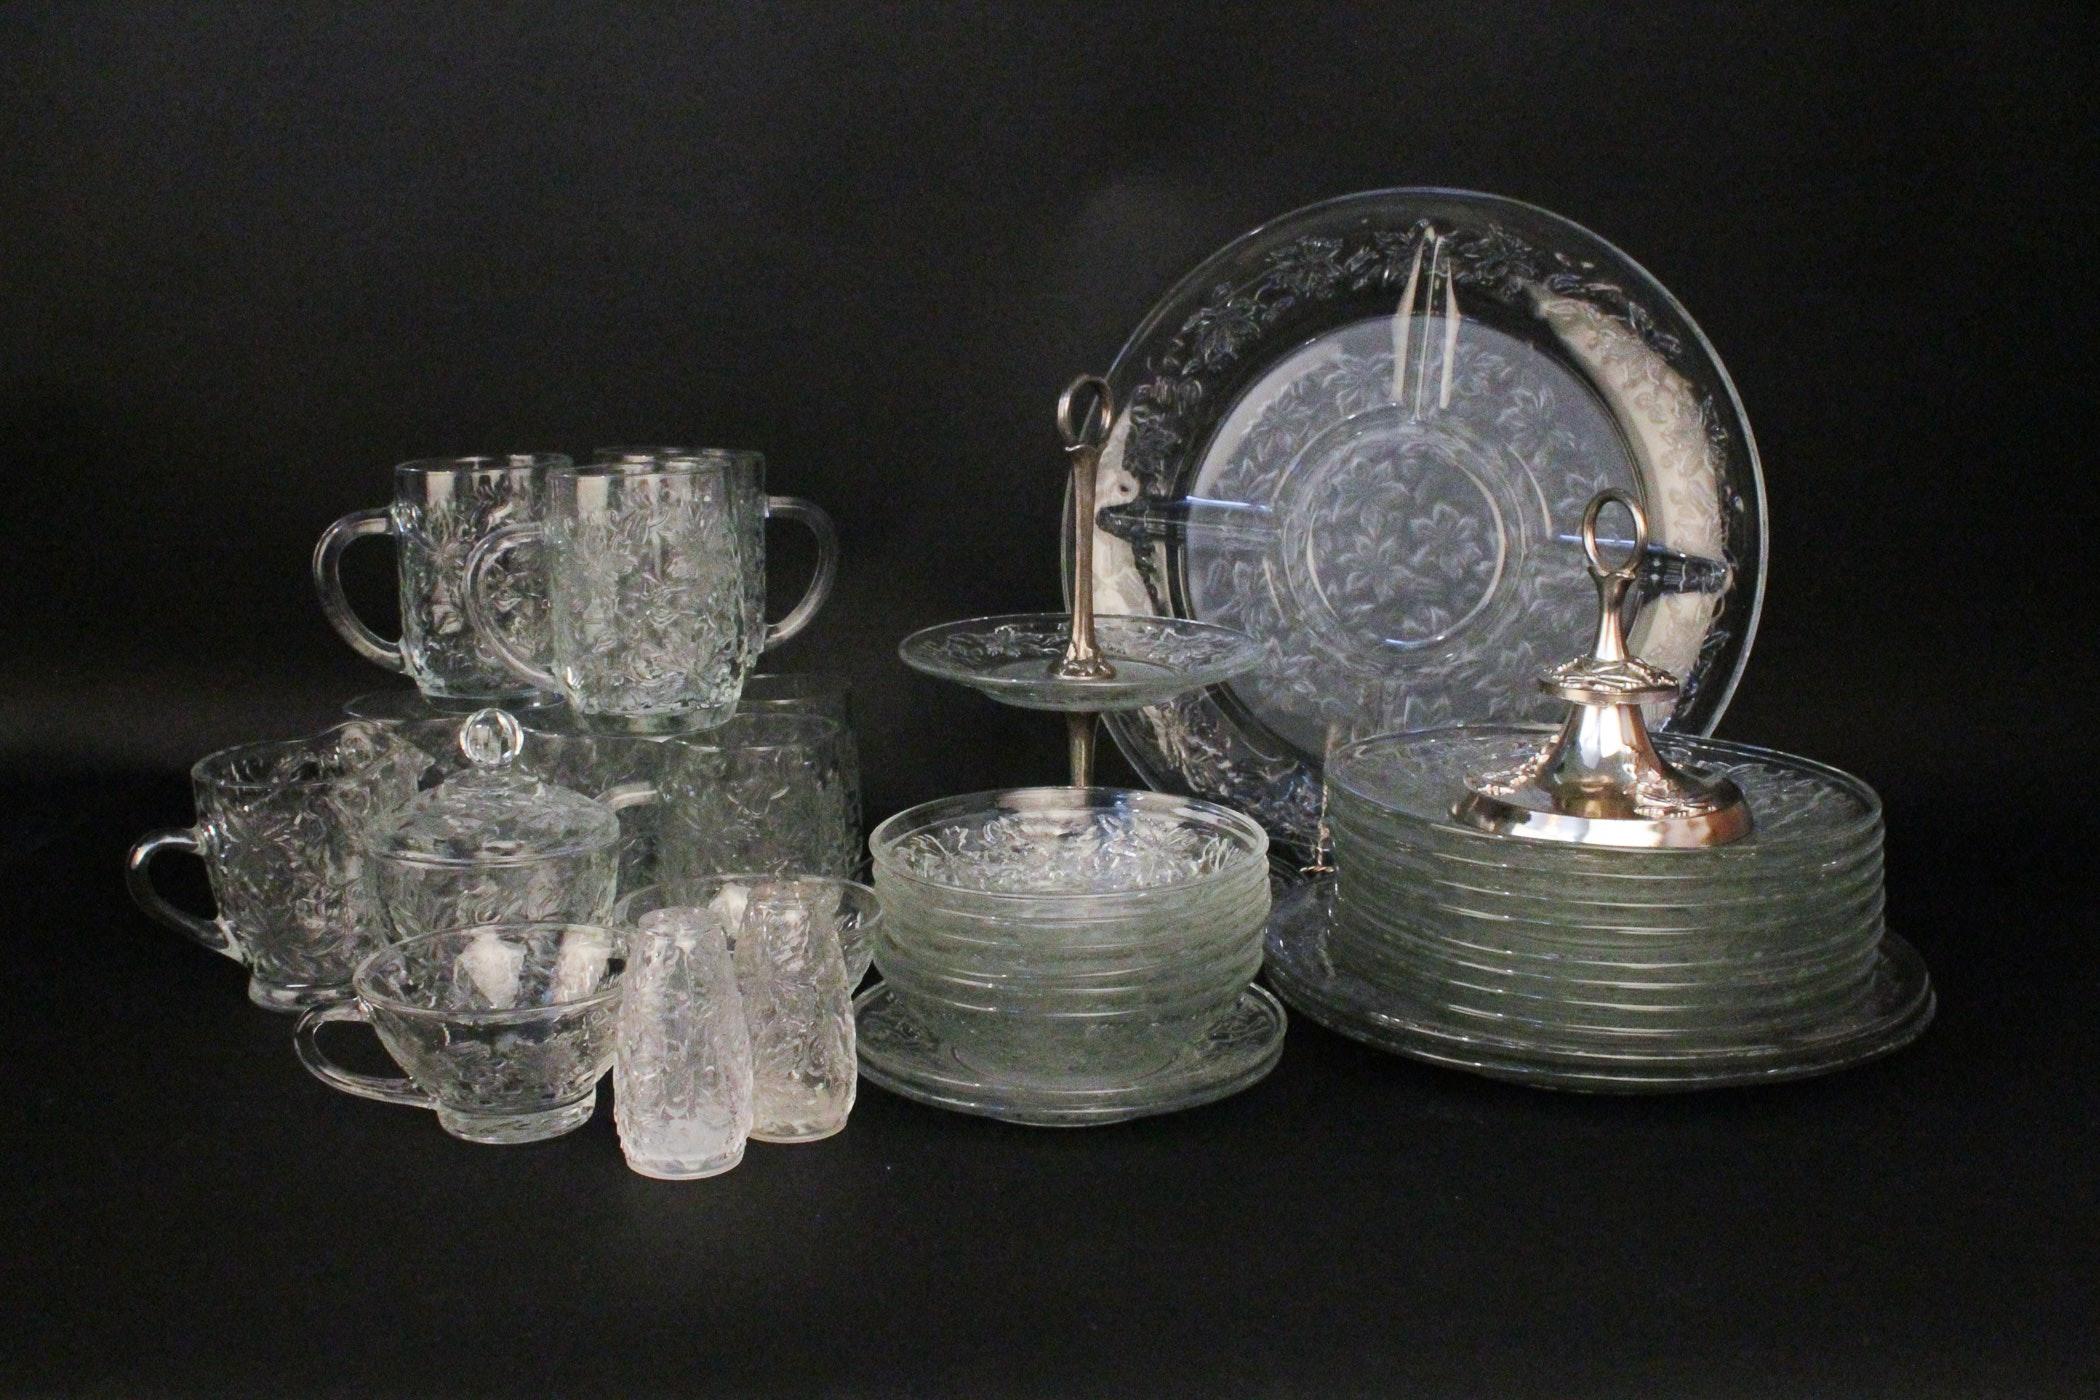 Princess House Fantasia Crystal Dishes ... & Princess House Fantasia Crystal Dishes : EBTH